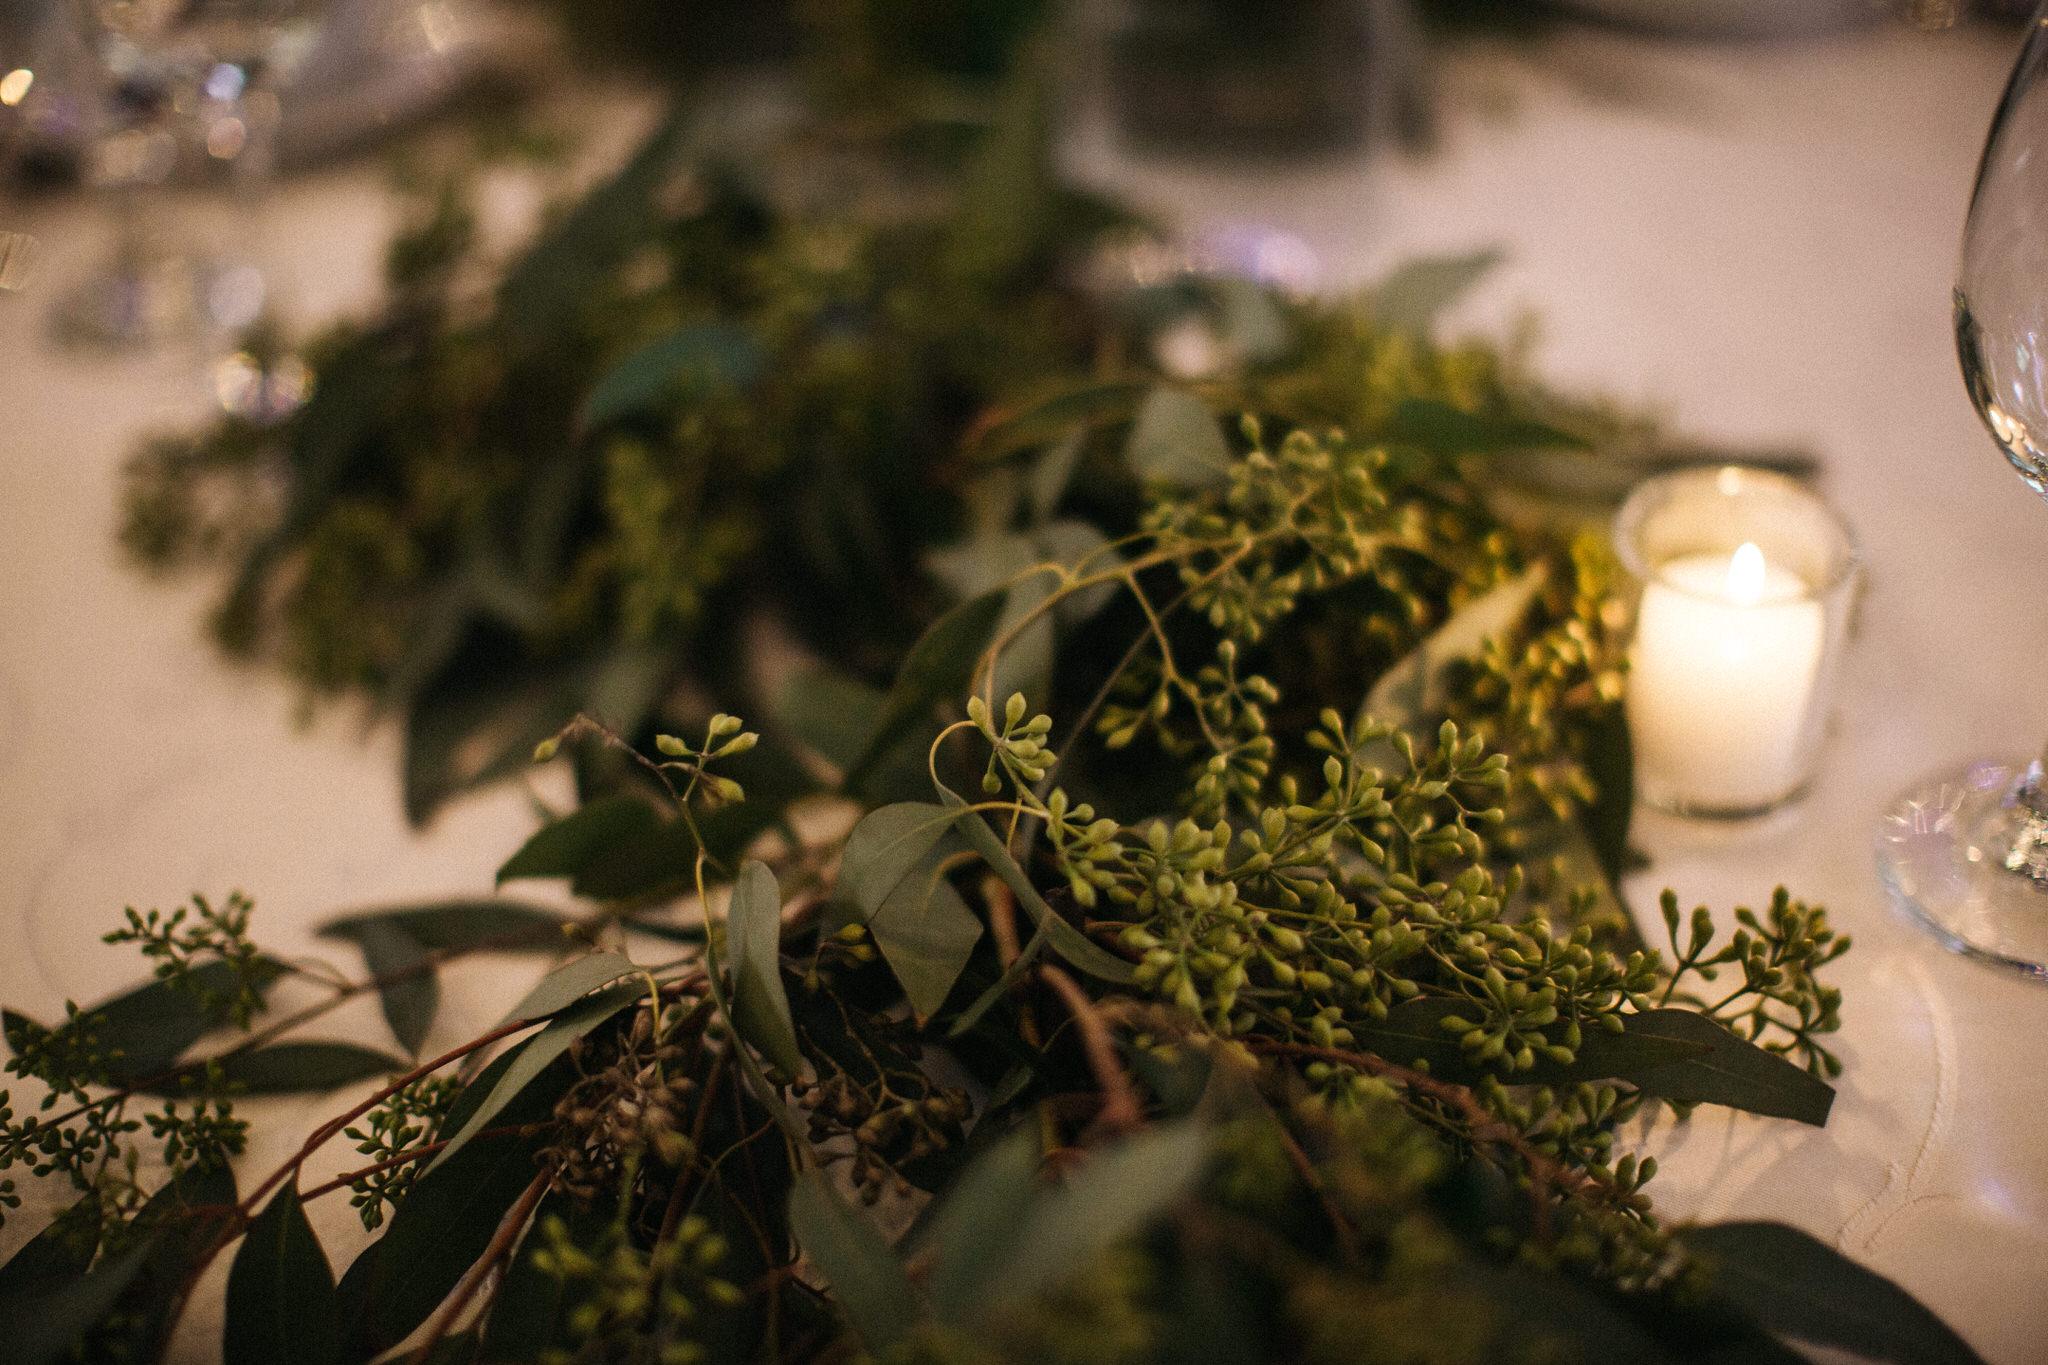 Table greenery, table decor, berkeley church wedding, toronto wedding photographer